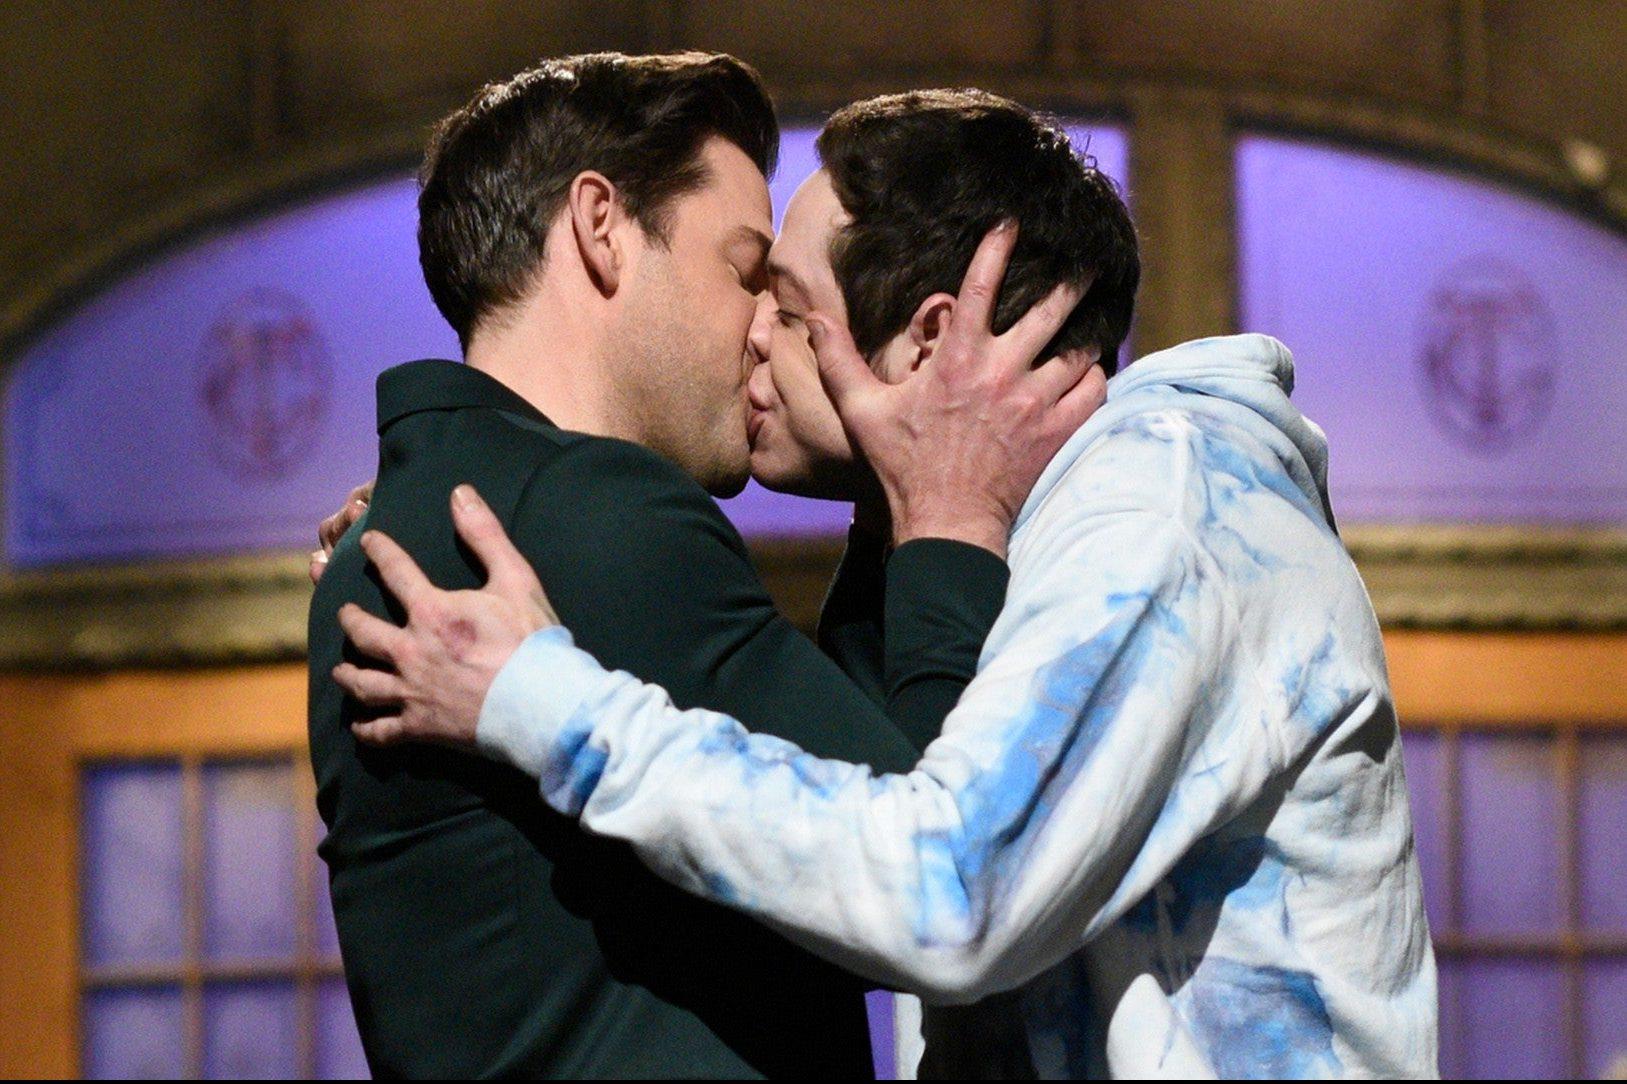 Friend kissed me my gay My lesbian